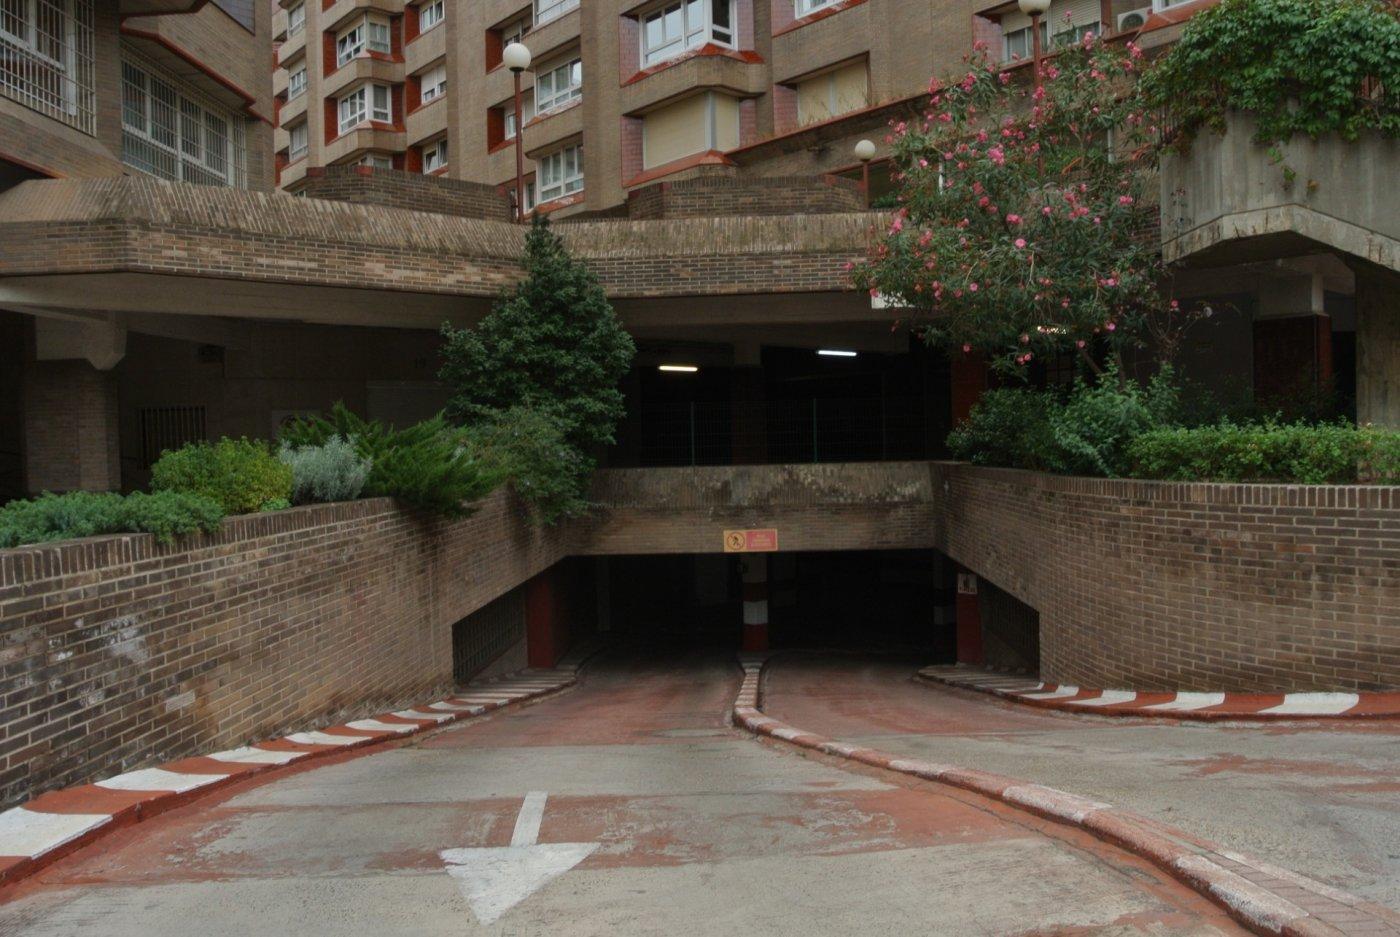 Plaza de garaje en tenor fleta - imagenInmueble1